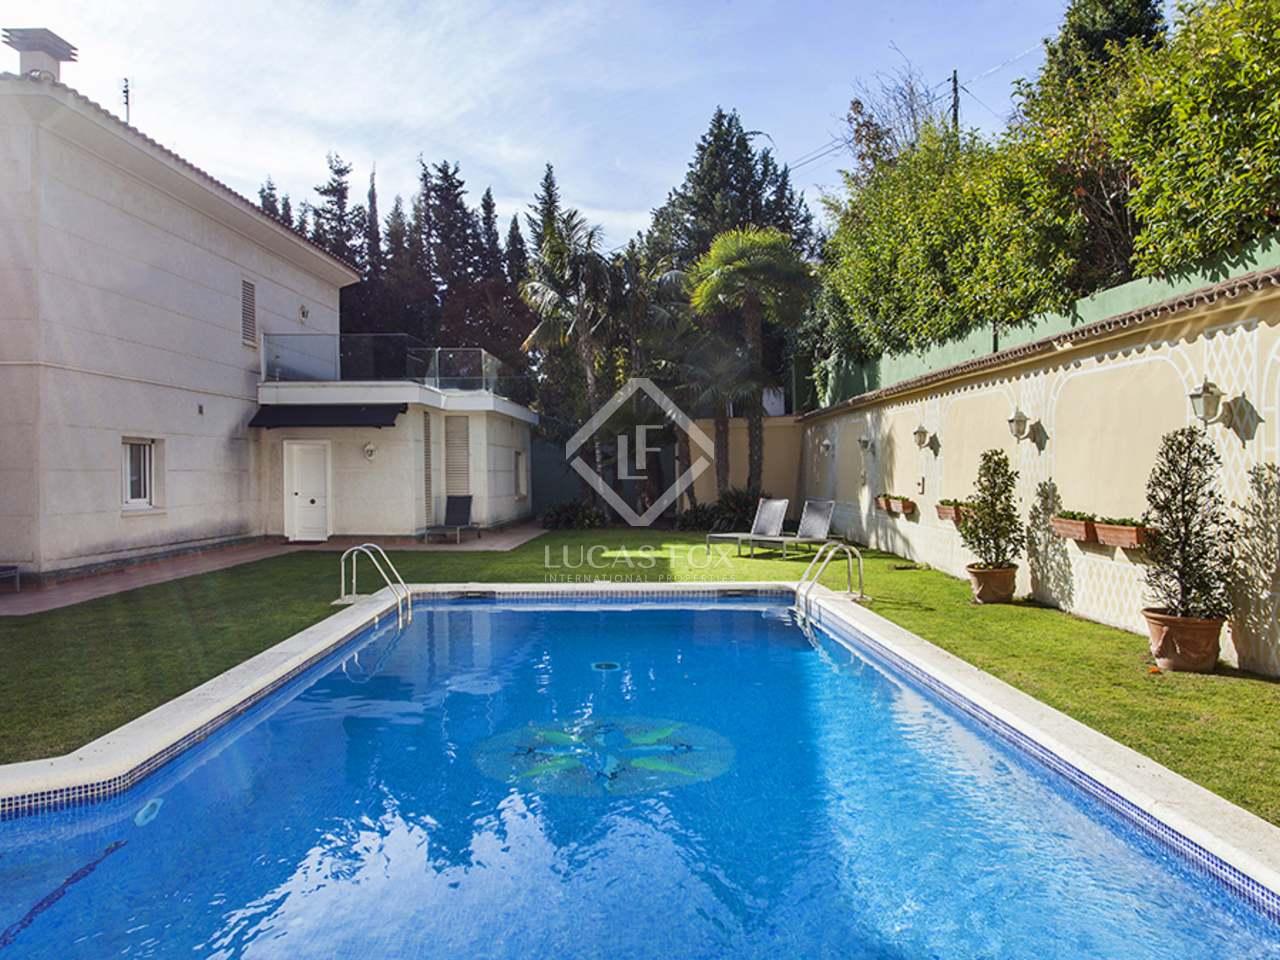 maison villa de 520m a vendre pedralbes barcelone. Black Bedroom Furniture Sets. Home Design Ideas